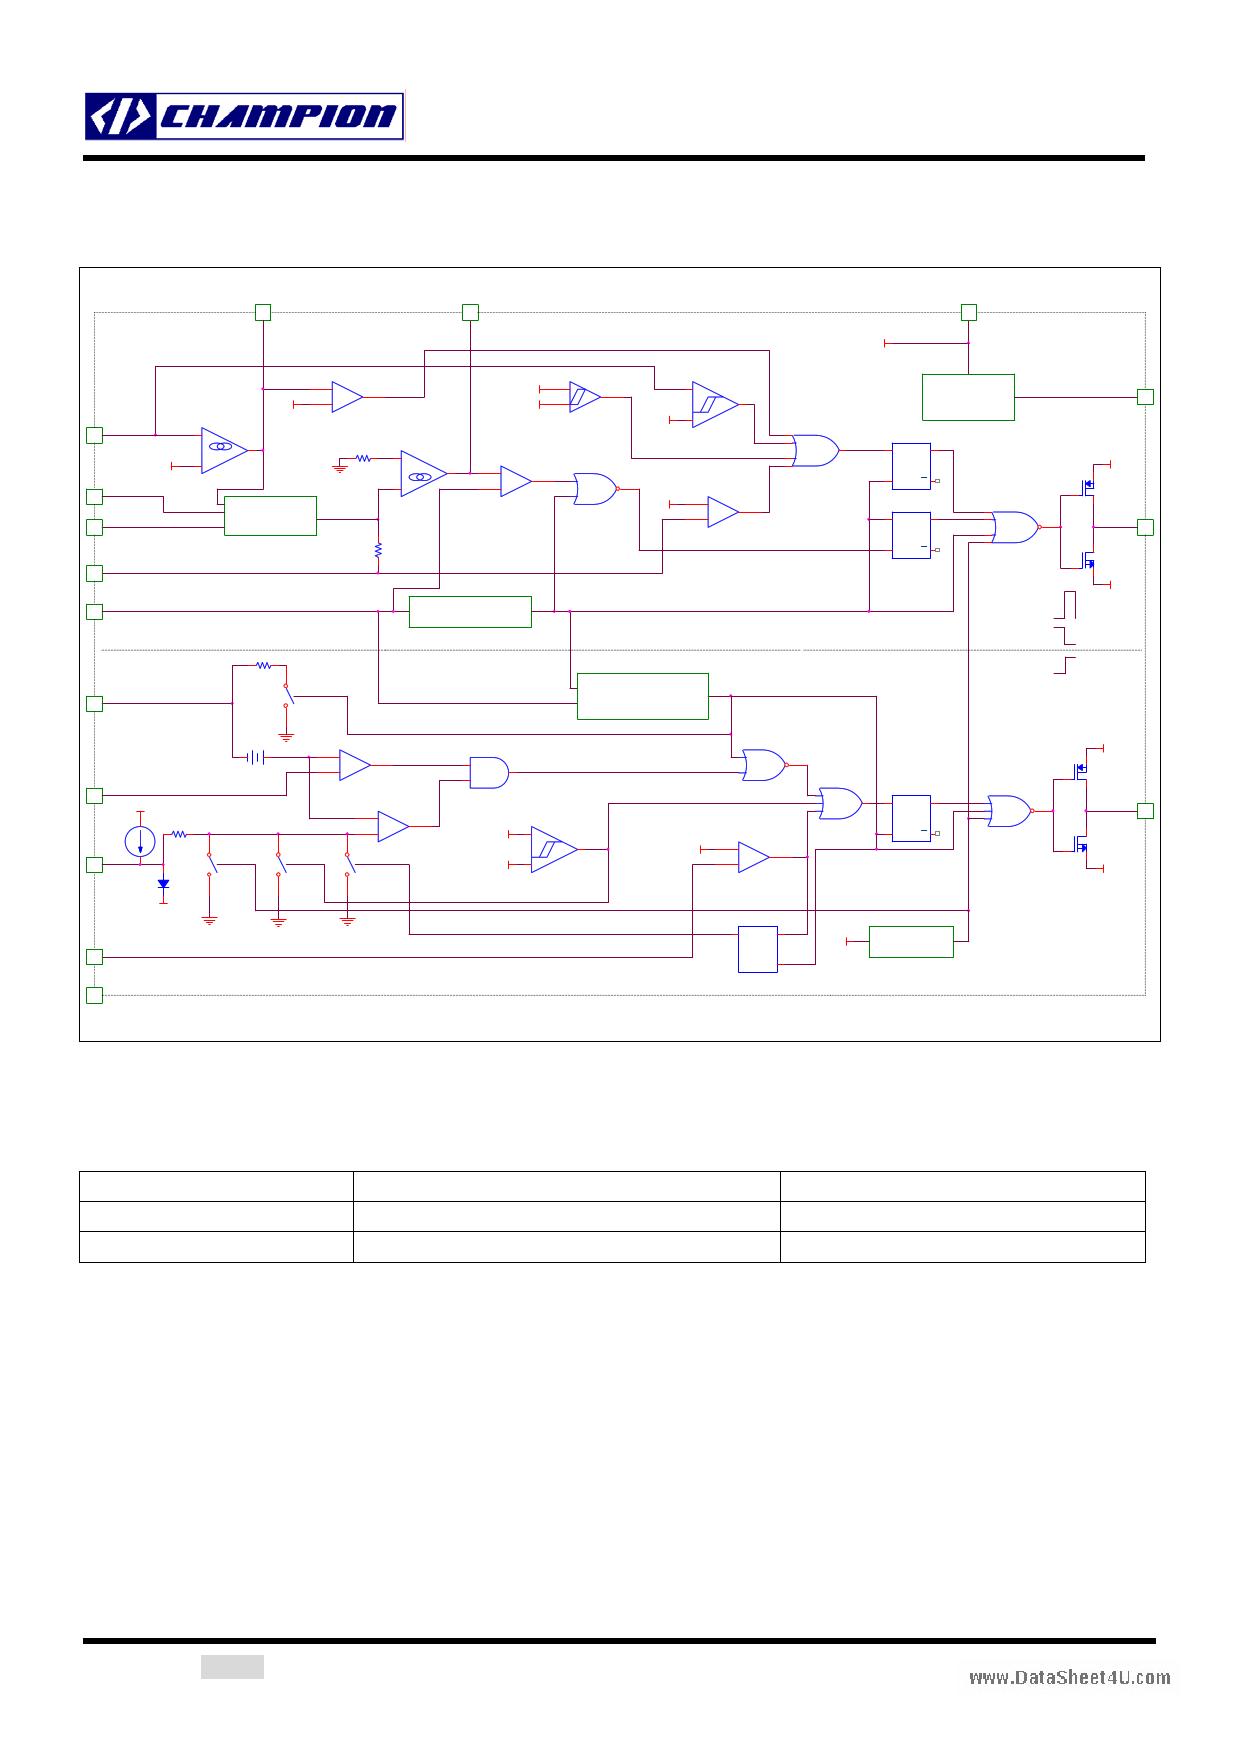 CM6800A pdf, ピン配列